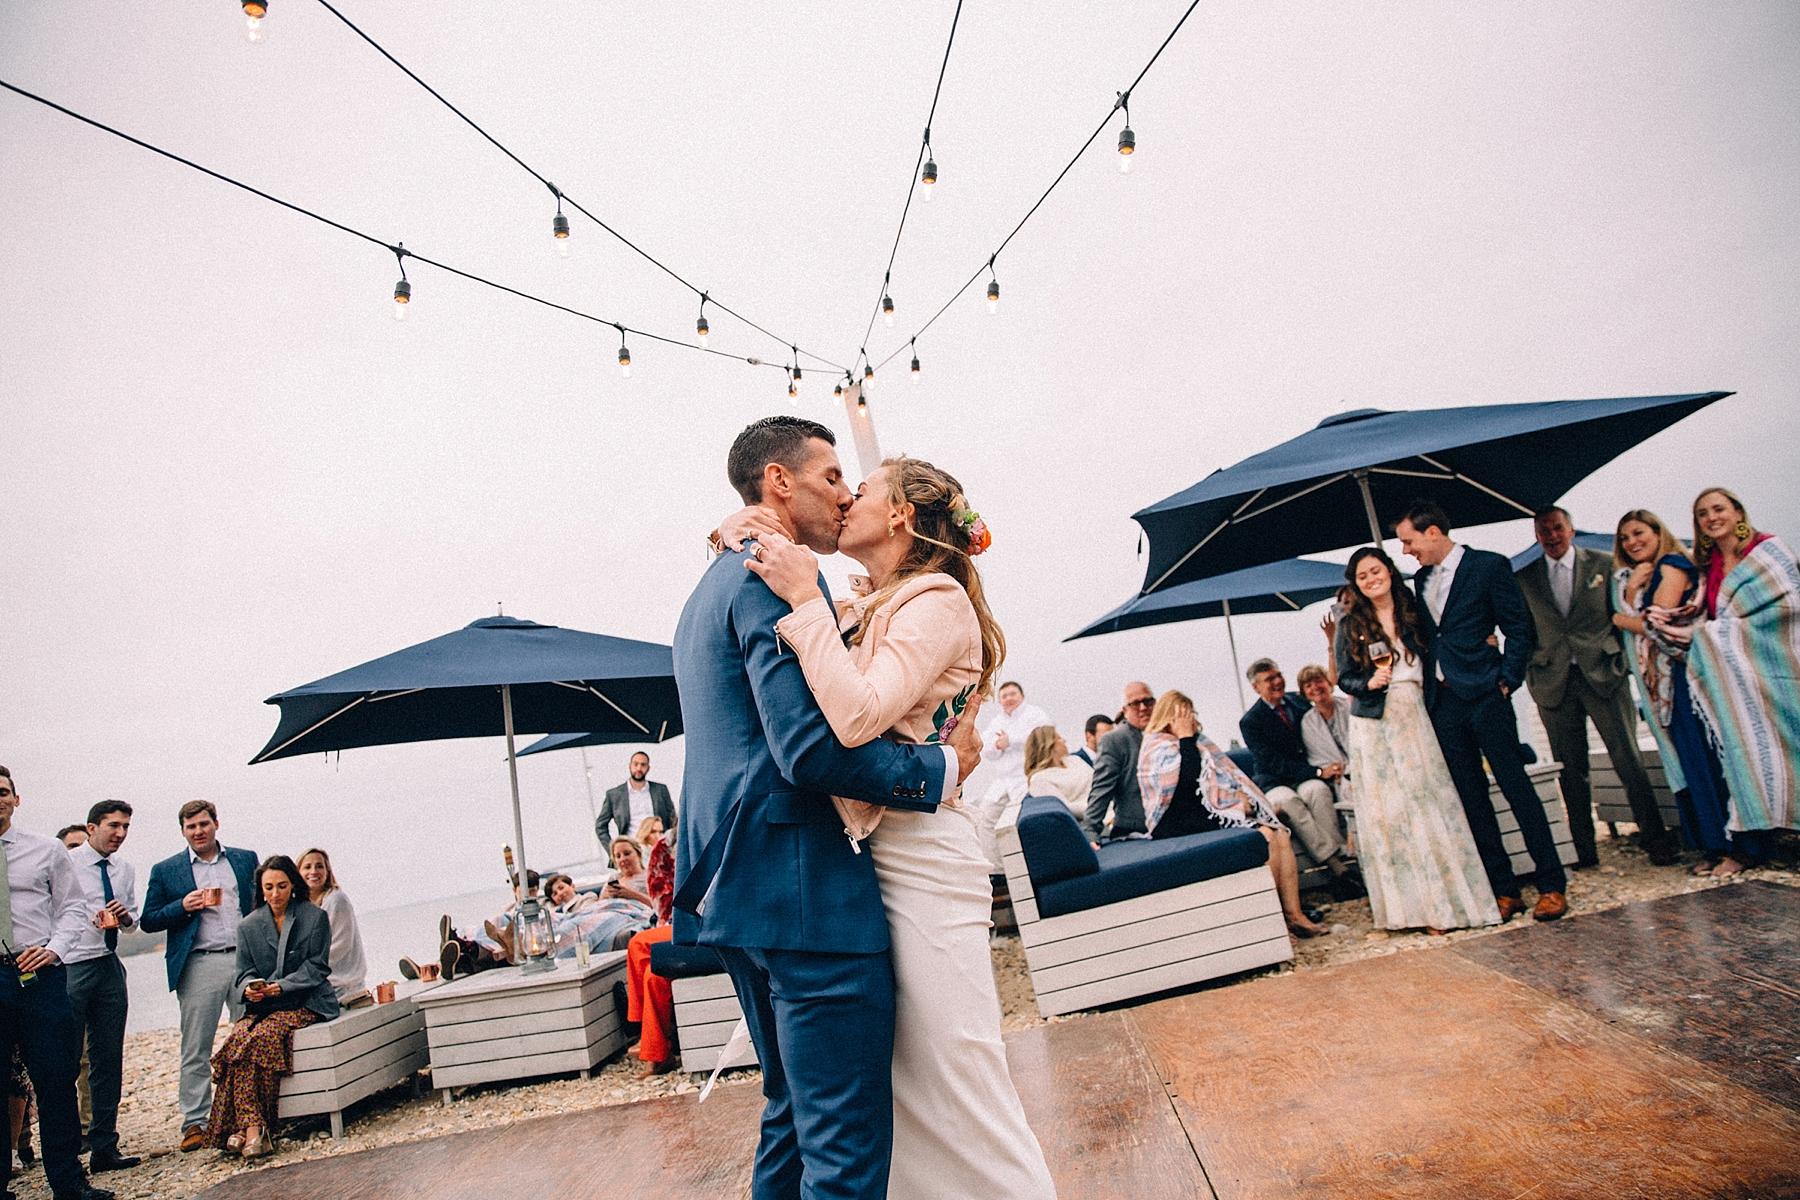 montauk-wedding-photography-rainy-navy-beach_0064.jpg